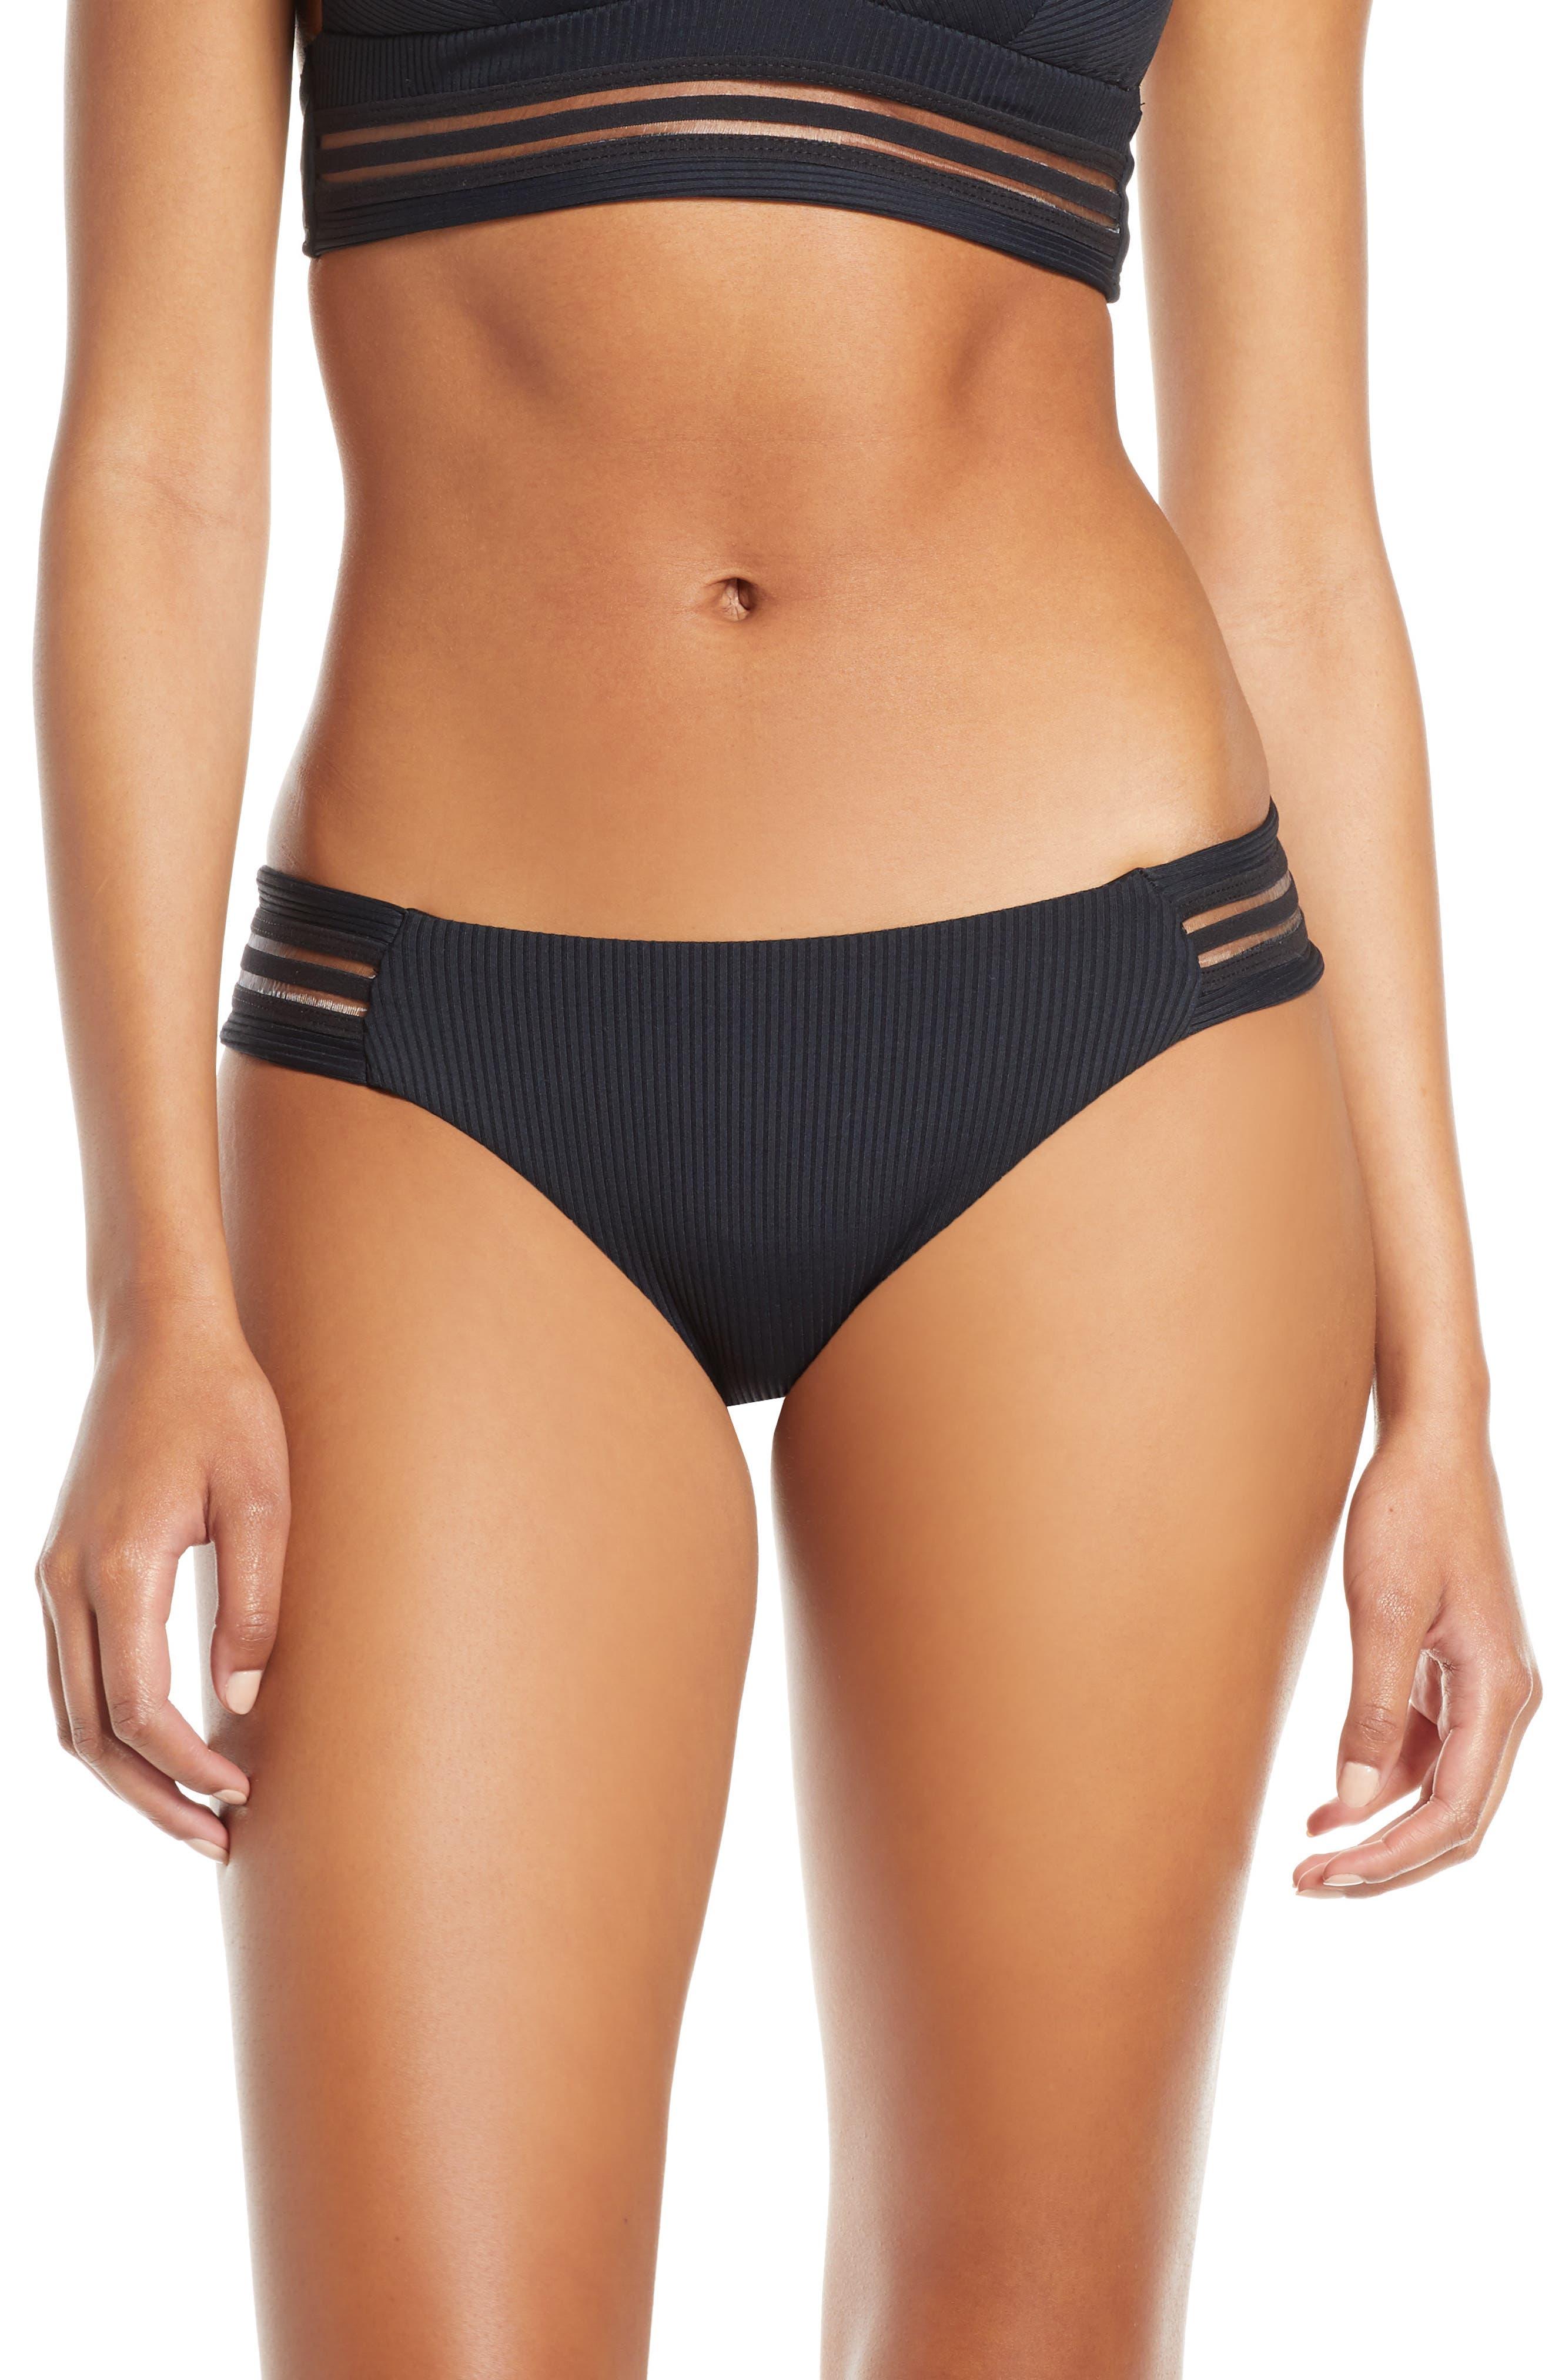 Isabella Rose Queensland Bikini Bottoms, Black